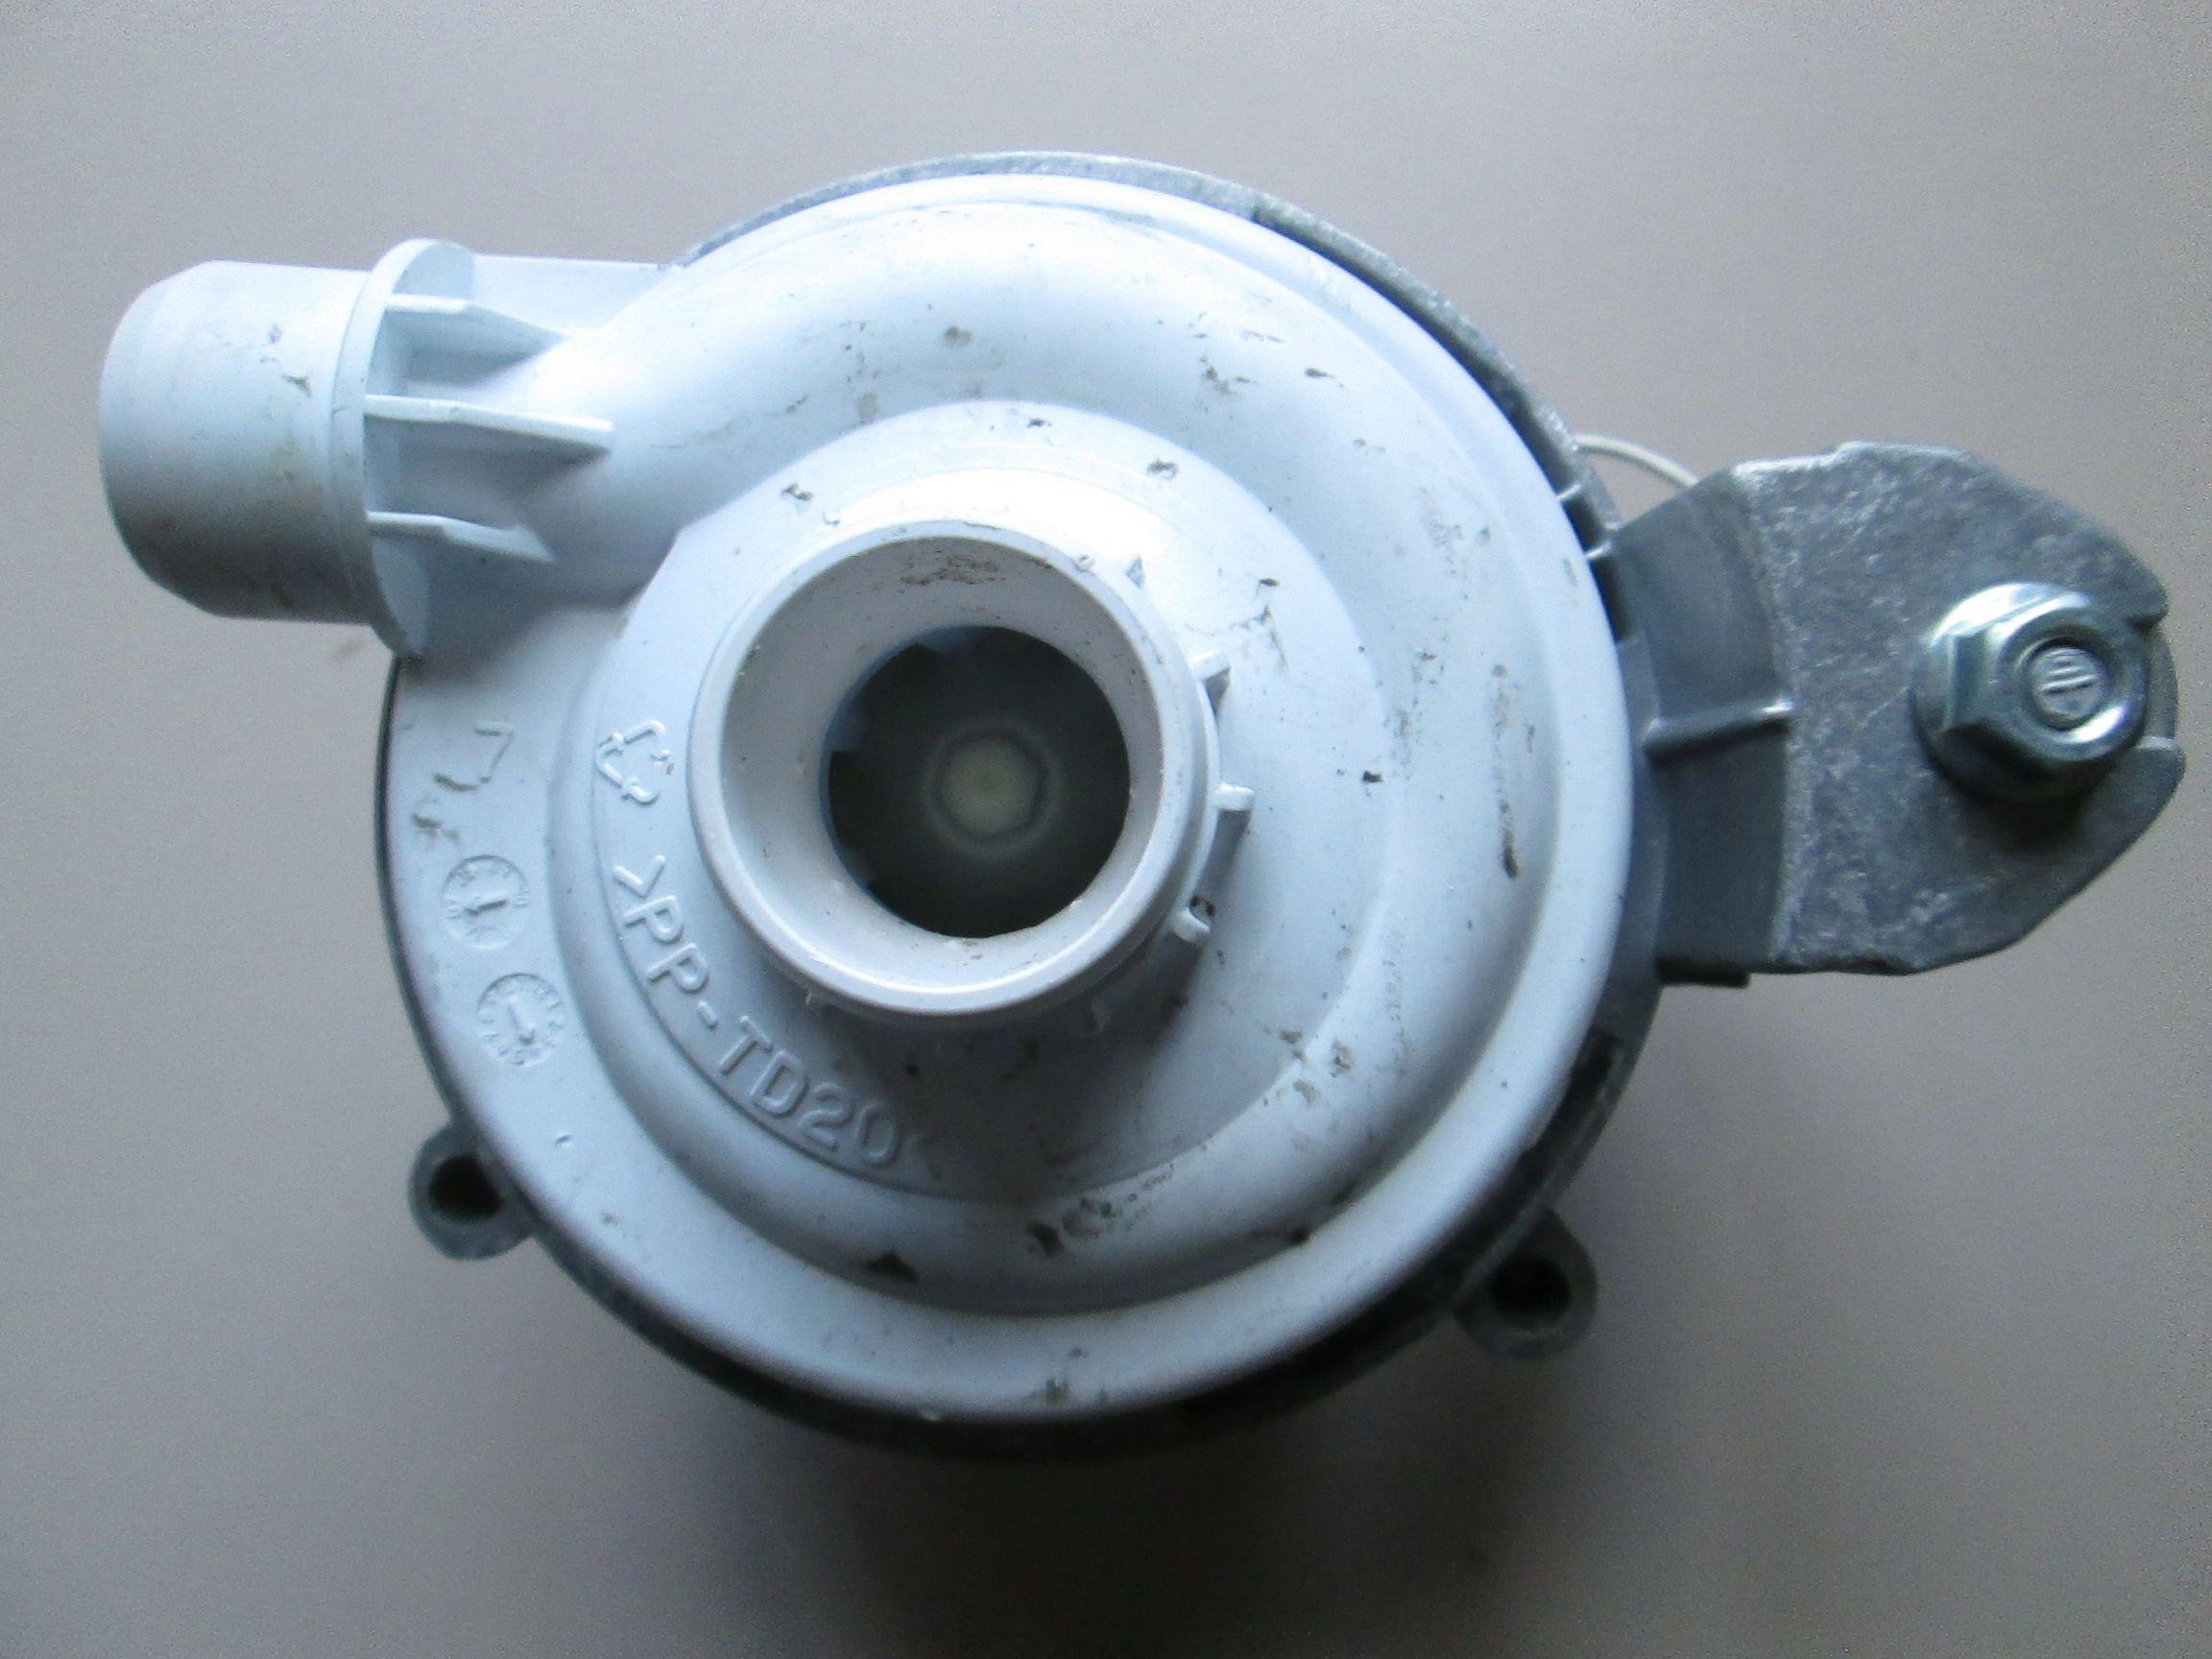 2x Spazzole per Bosch//Siemens 088421 0920 24 092025 092094 0963 31 096357